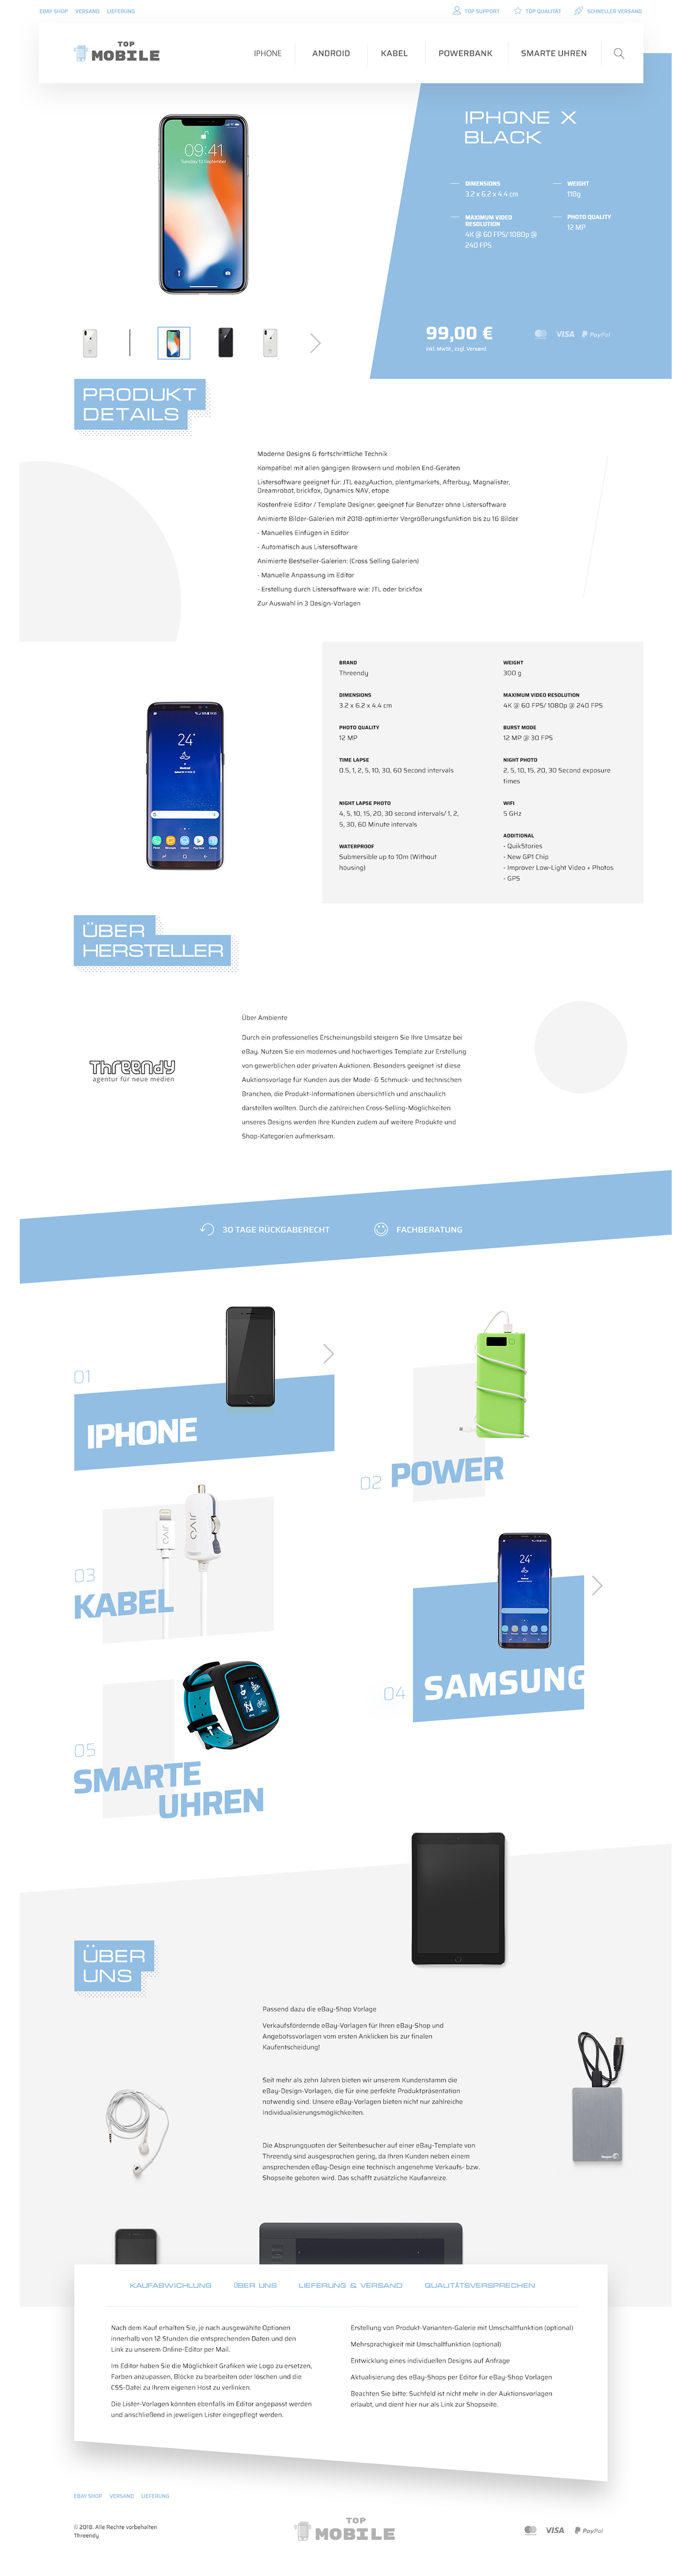 Auktion Template Mobile, Tablet & Smartphone Zubehör Branche